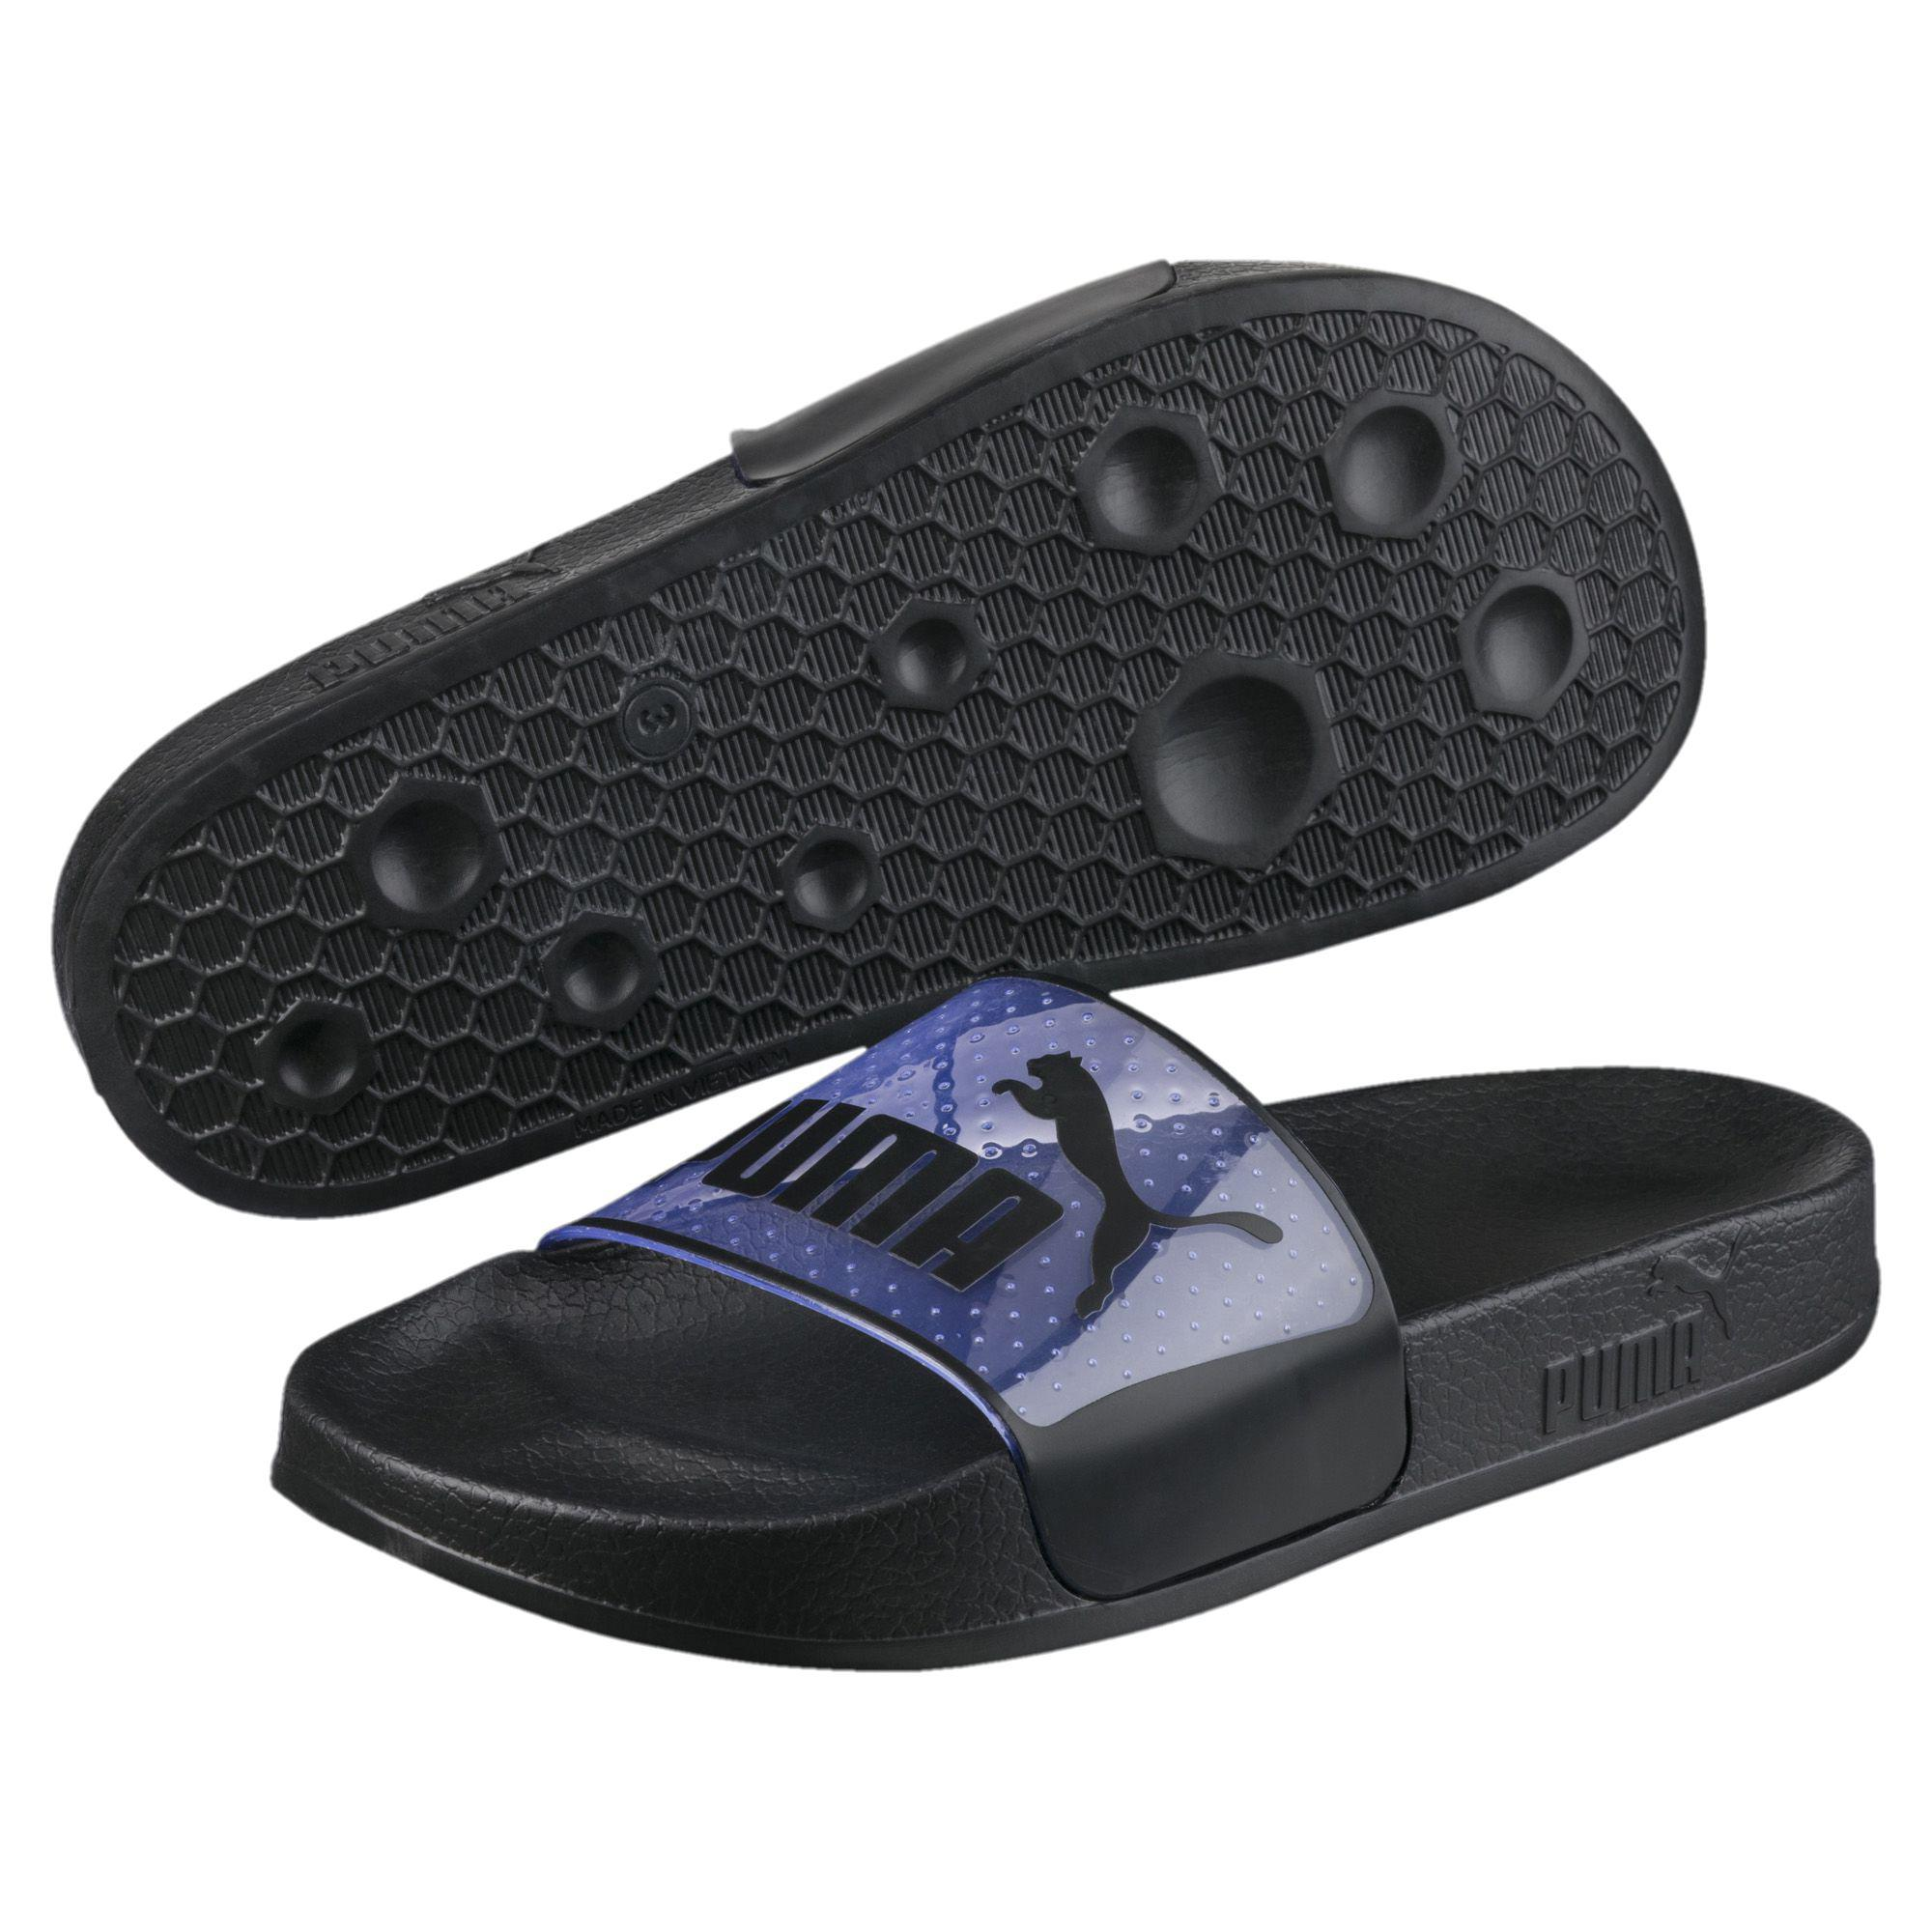 Lyst - PUMA Leadcat Jelly Women s Slide Sandals in Black for Men 483da0775